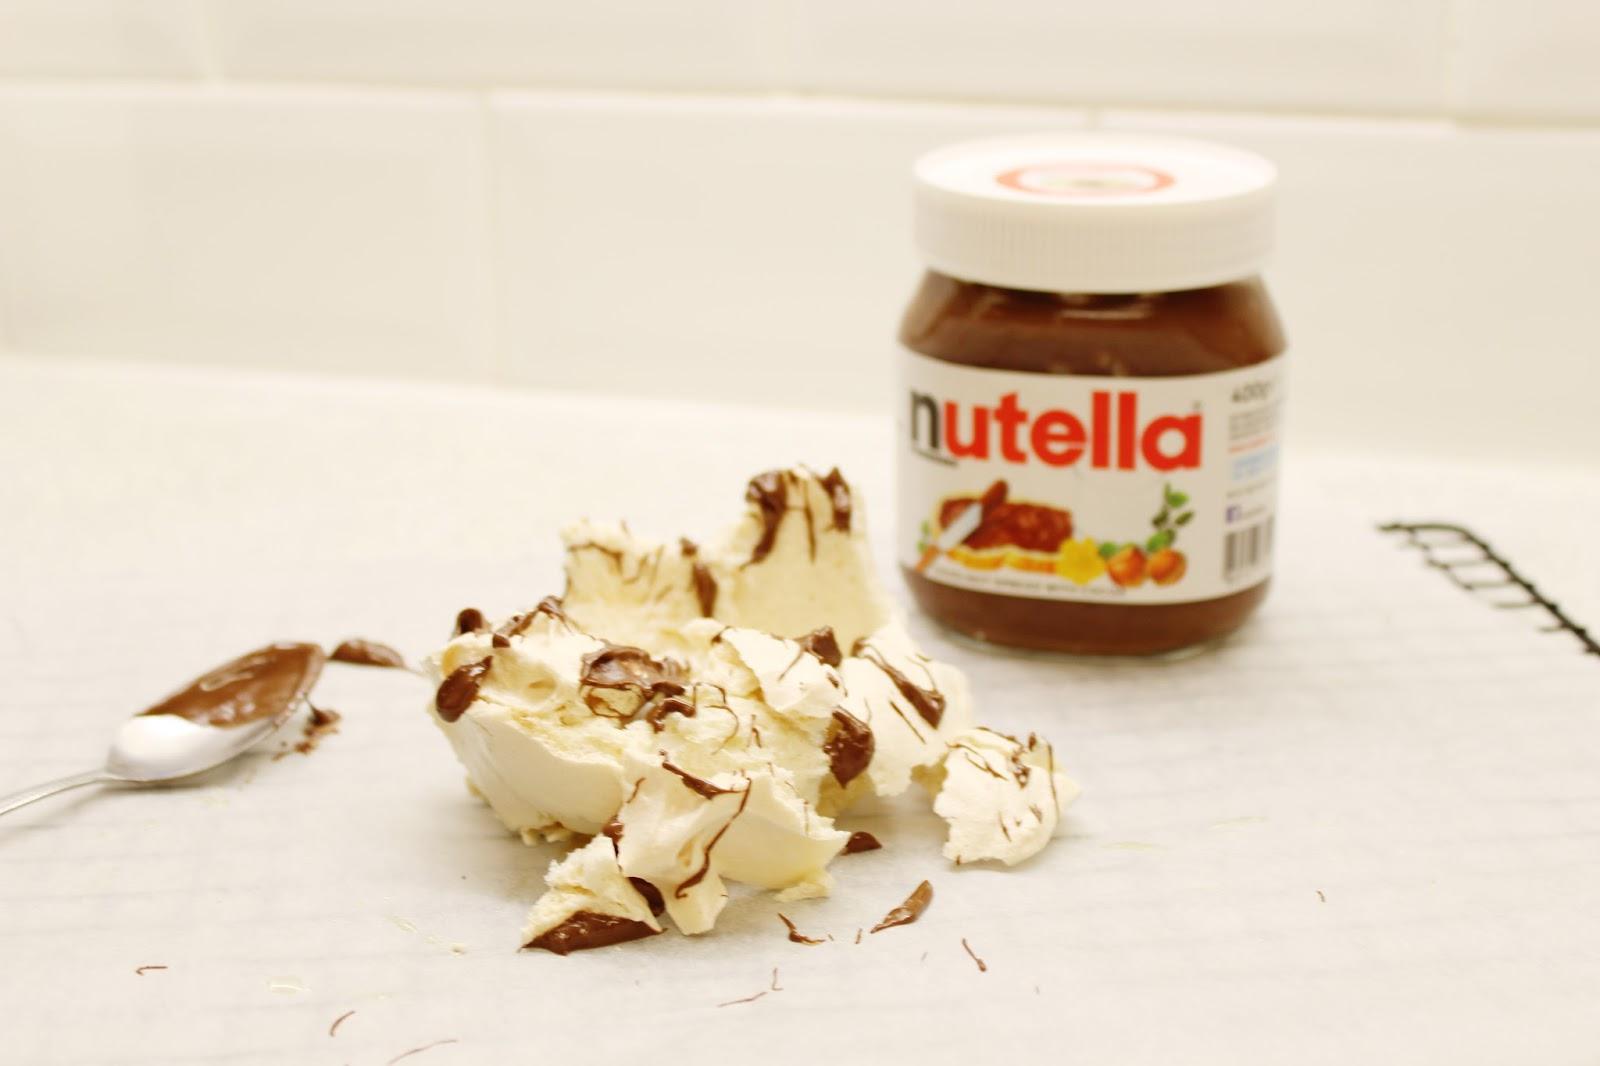 Freshly baked, homemade Mary Berry meringue recipe with Nutella